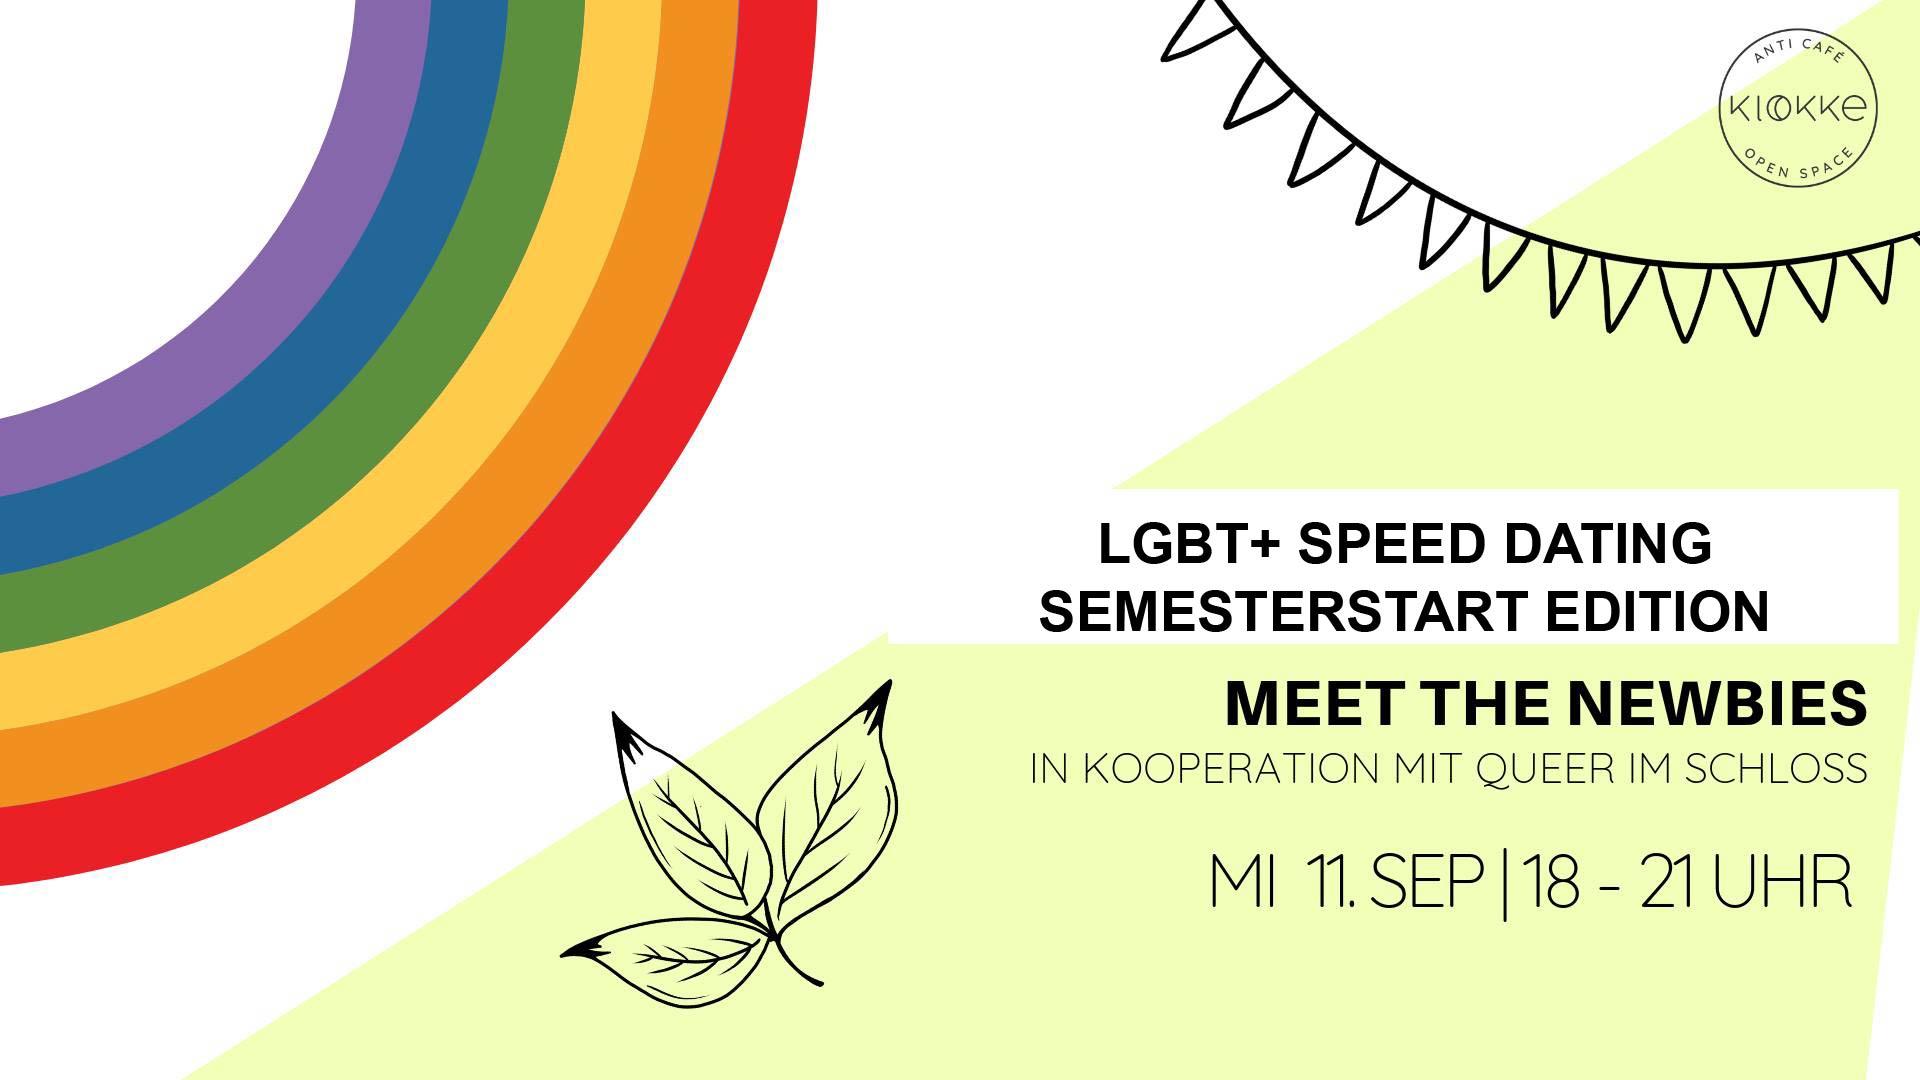 LGBT+ Speed Dating – Semesterstart Edition, 11.09.19, 6 PM